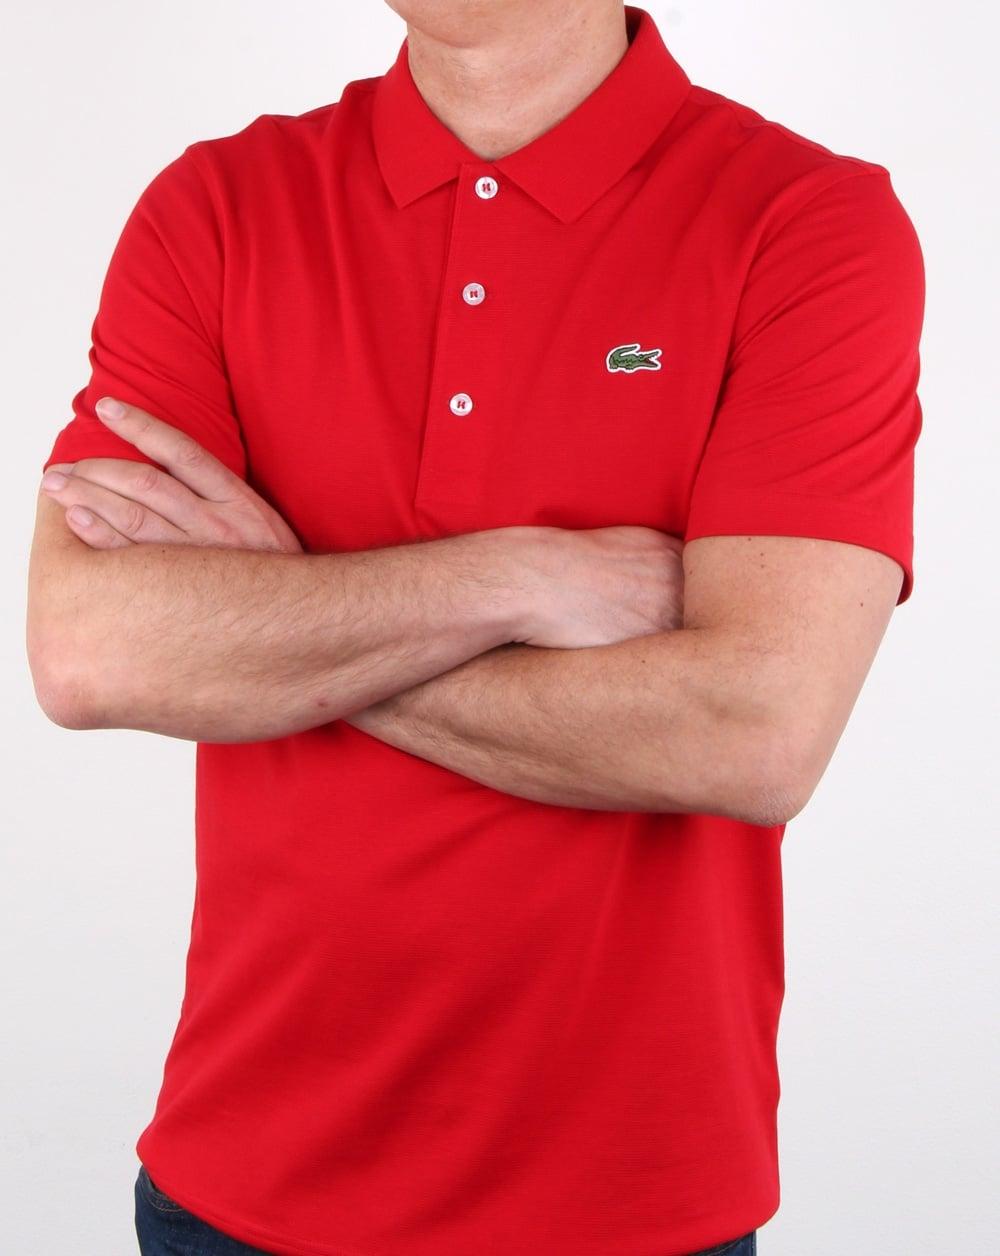 Lacoste Polo Shirt Red Mens Polo Sport Croc Gym Fashion